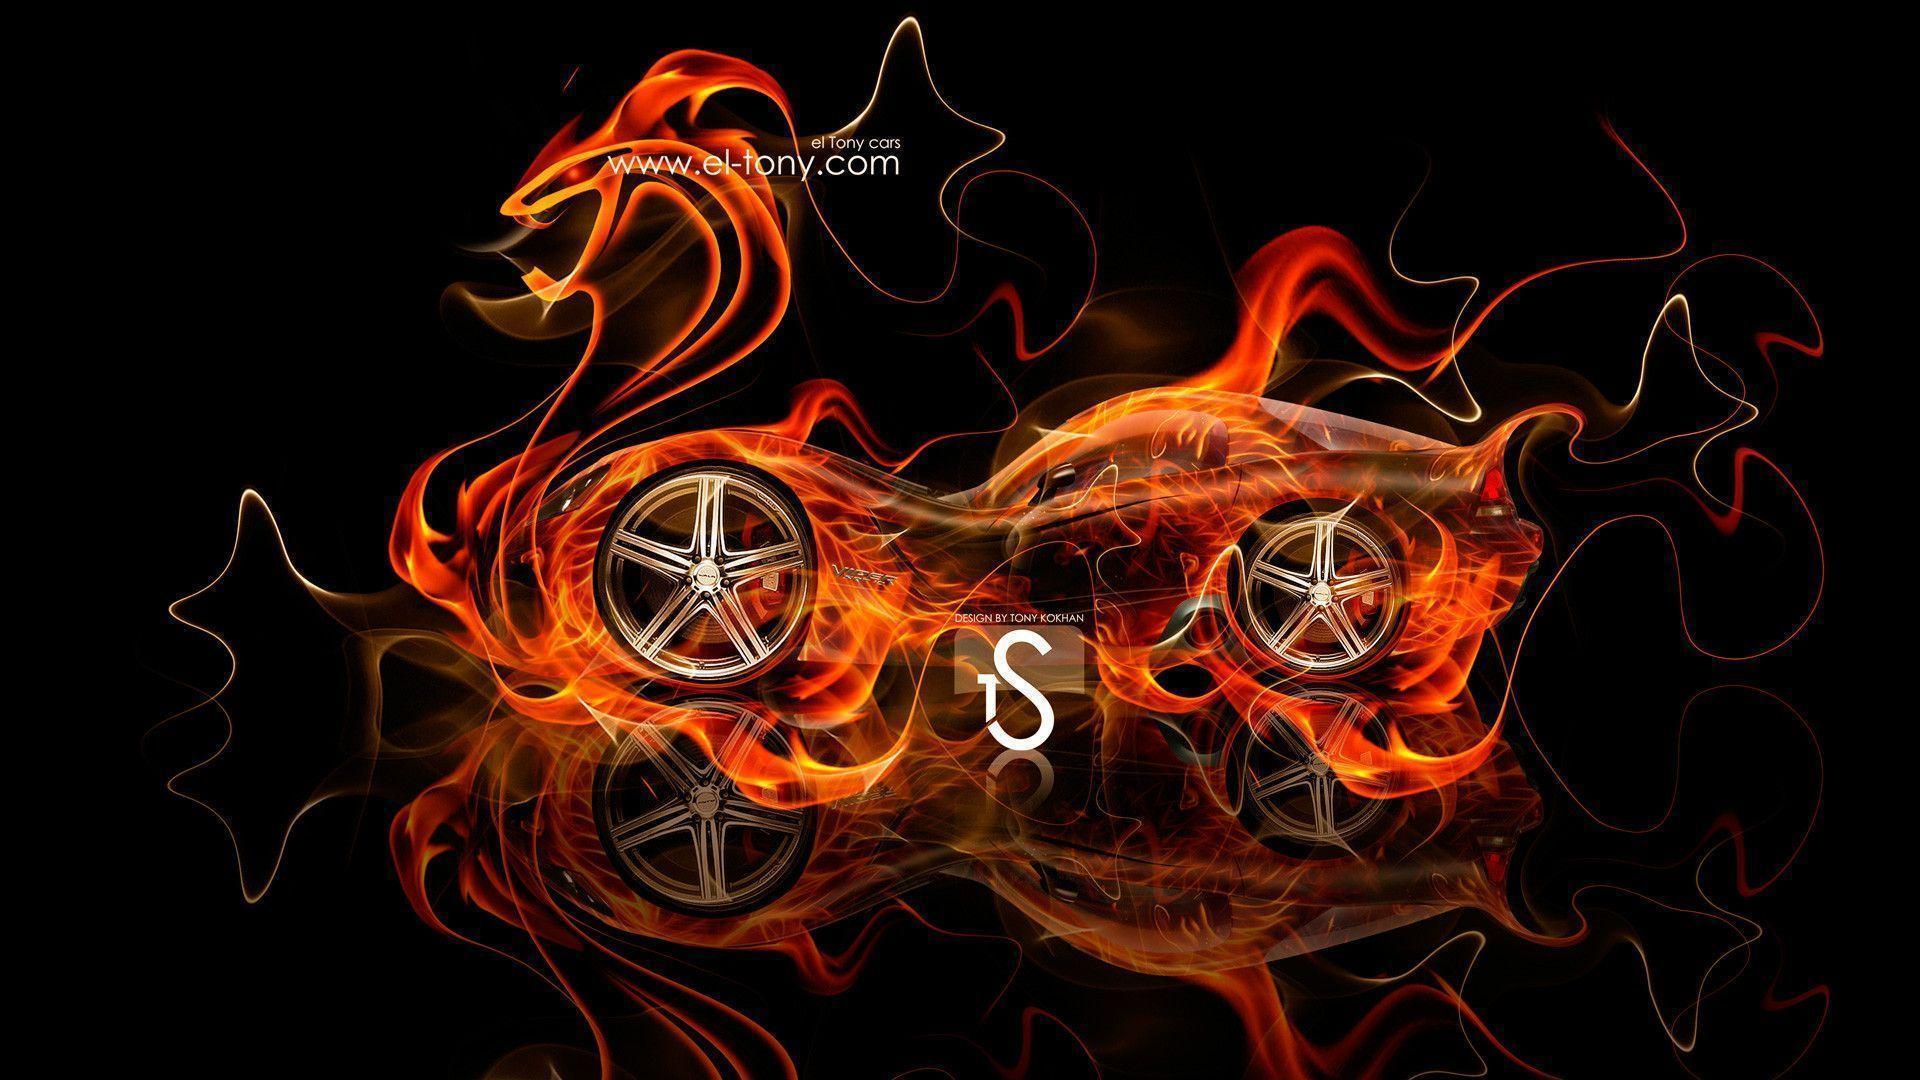 Nice Dodge Viper SRT/10 Fantasy Fire Snake Car 2013 « El Tony Amazing Pictures